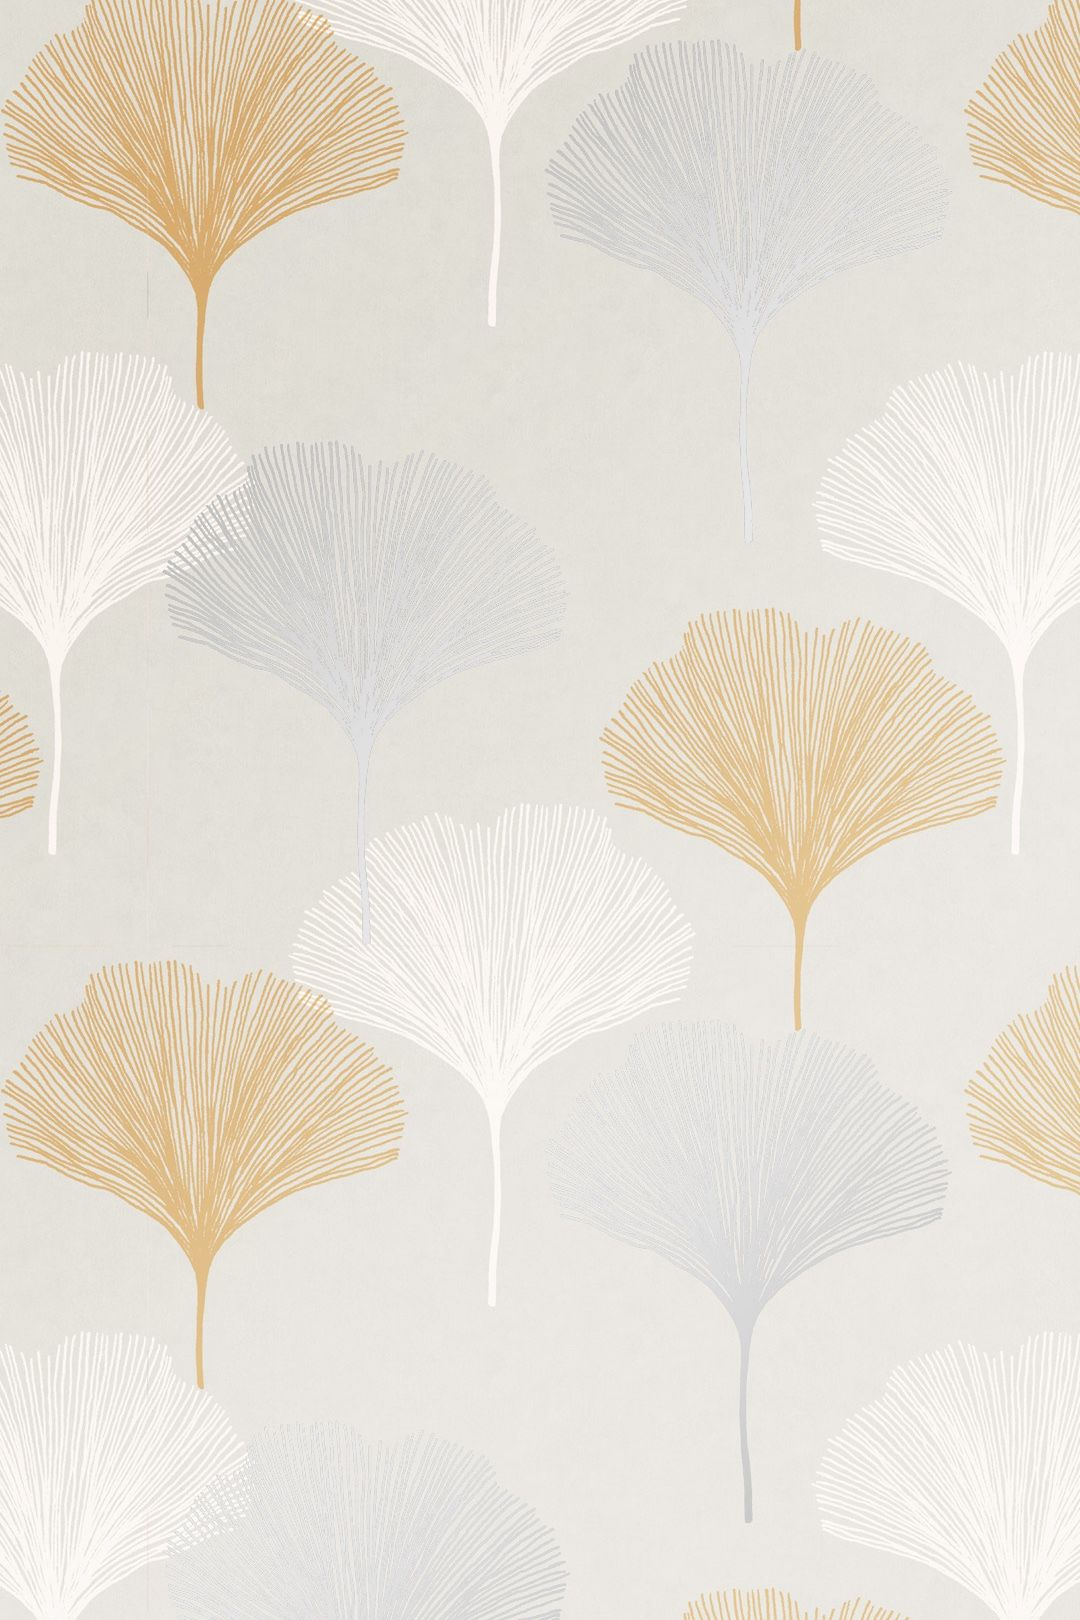 I LOVE WALLPAPER Gingko Leaf Wallpaper Grey Yellow. Keep